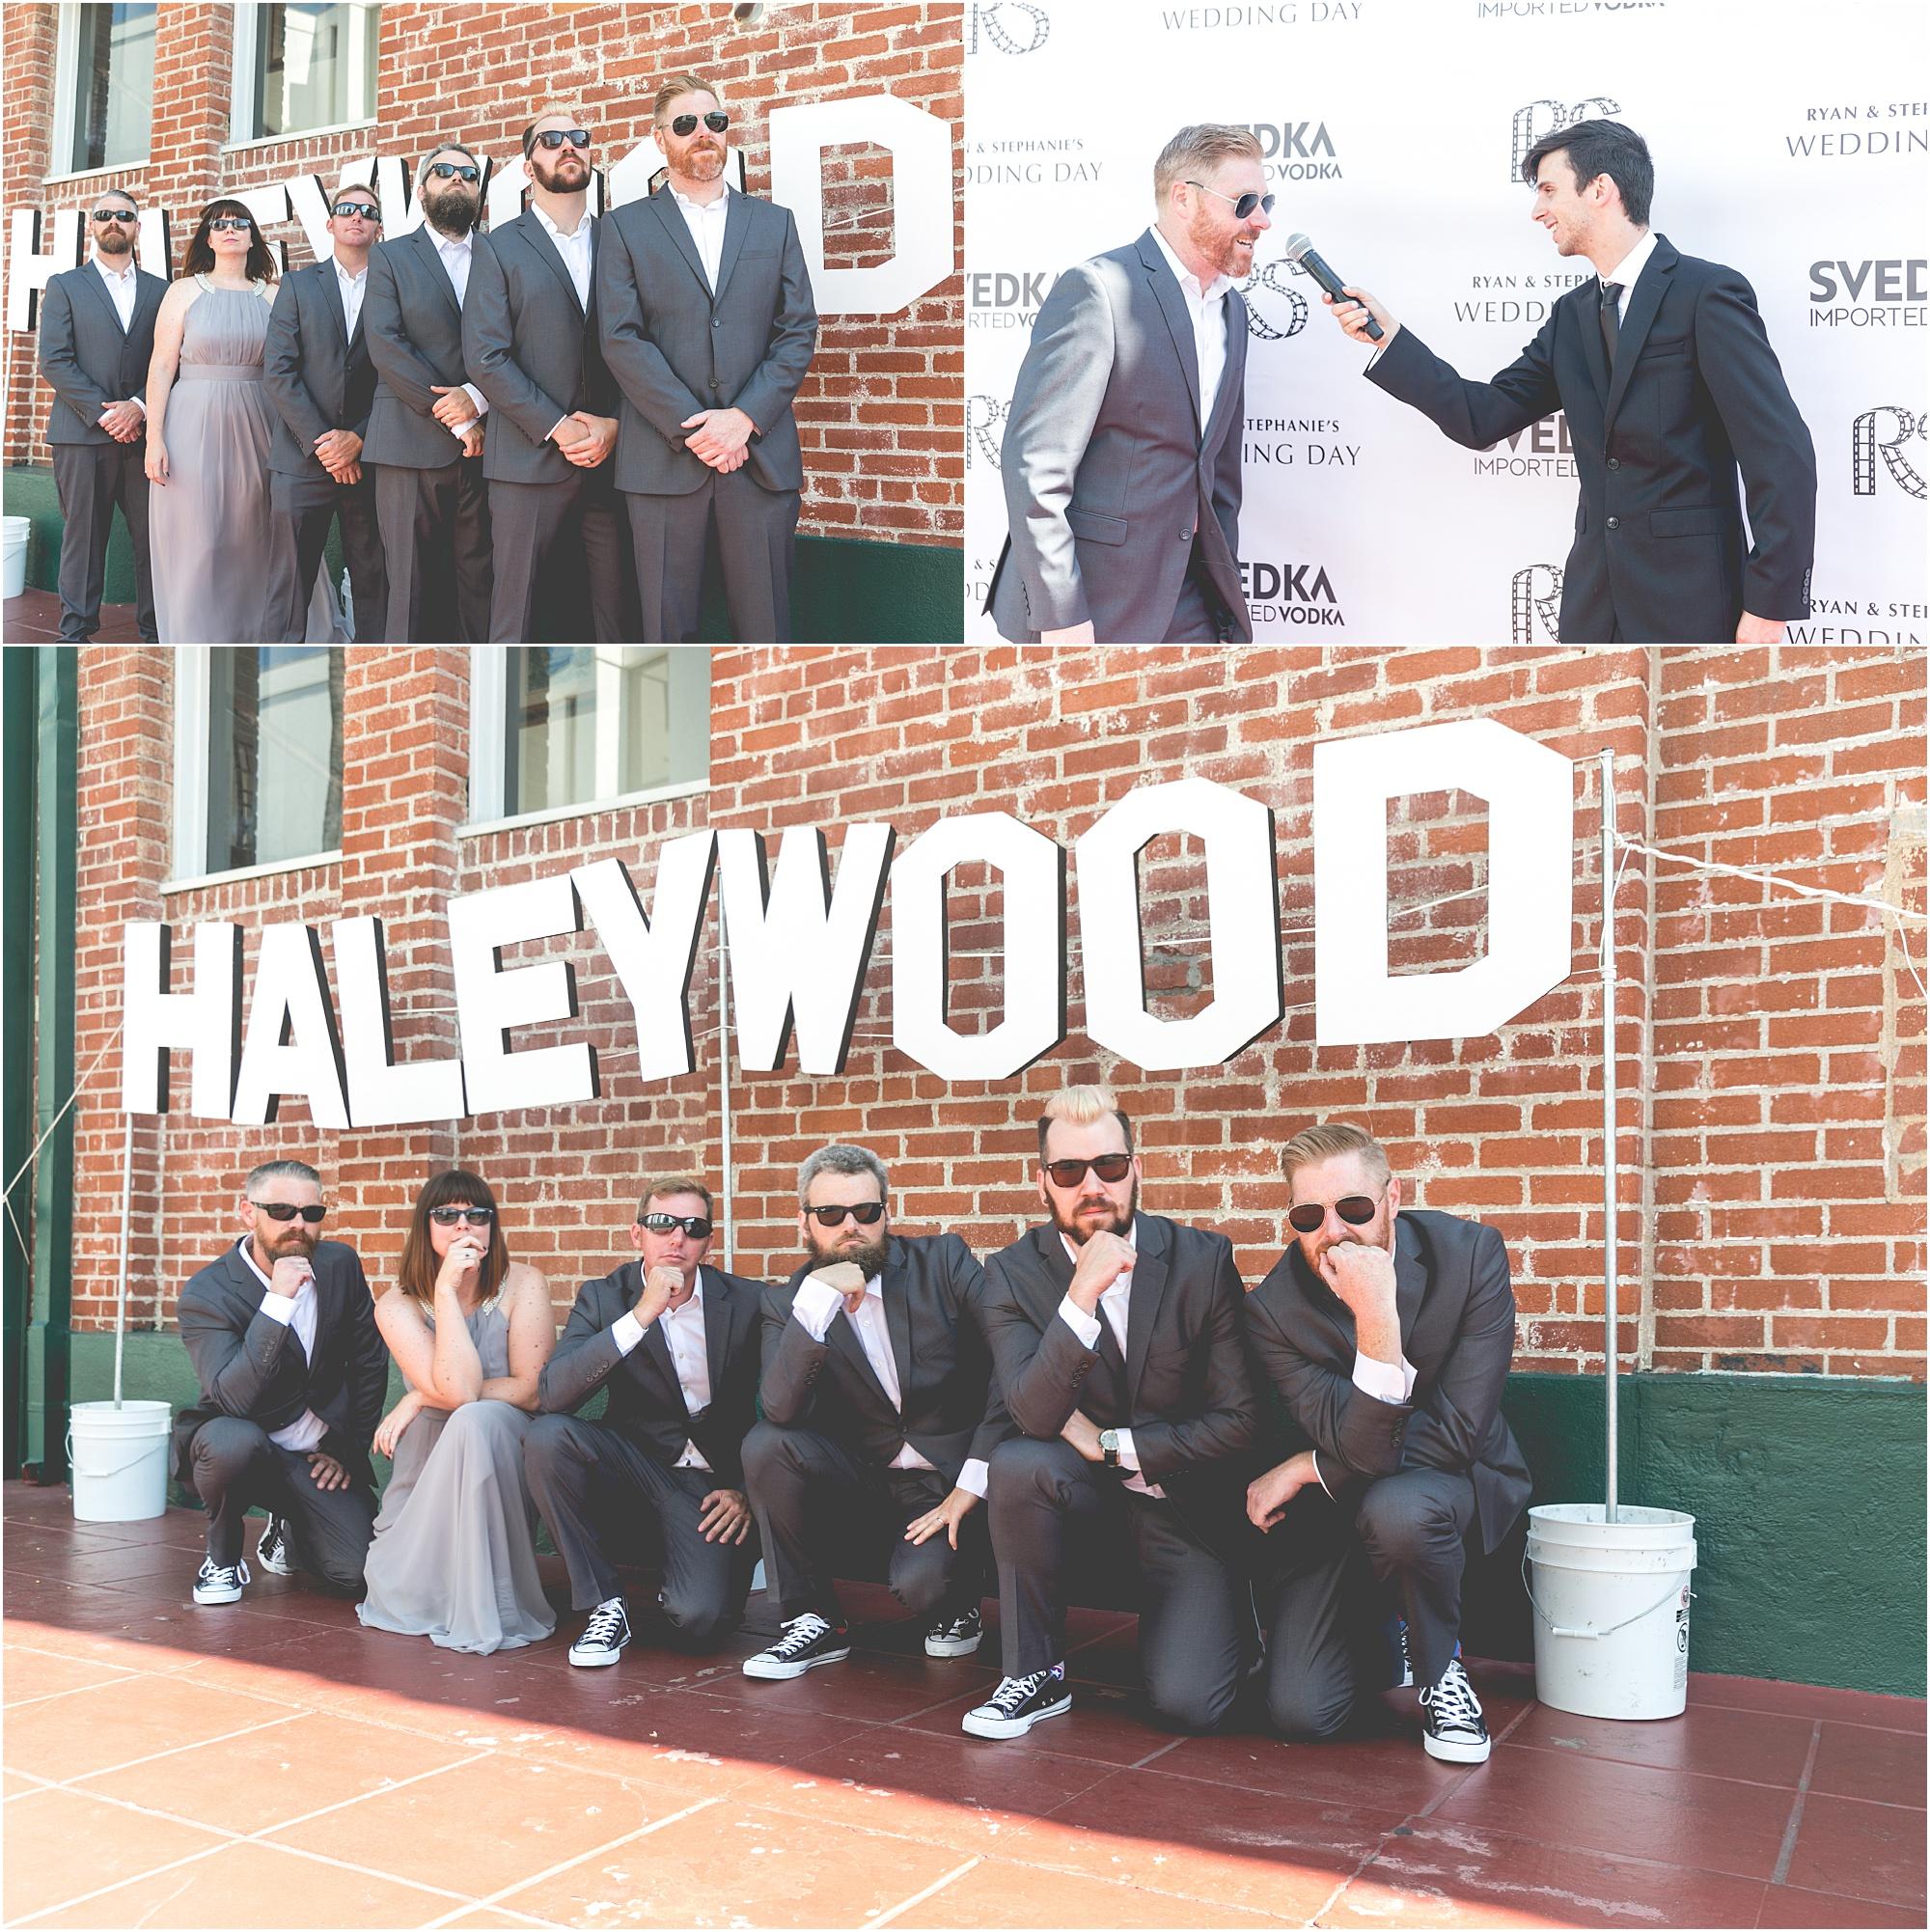 Haley Wedding Stomps 1.jpg